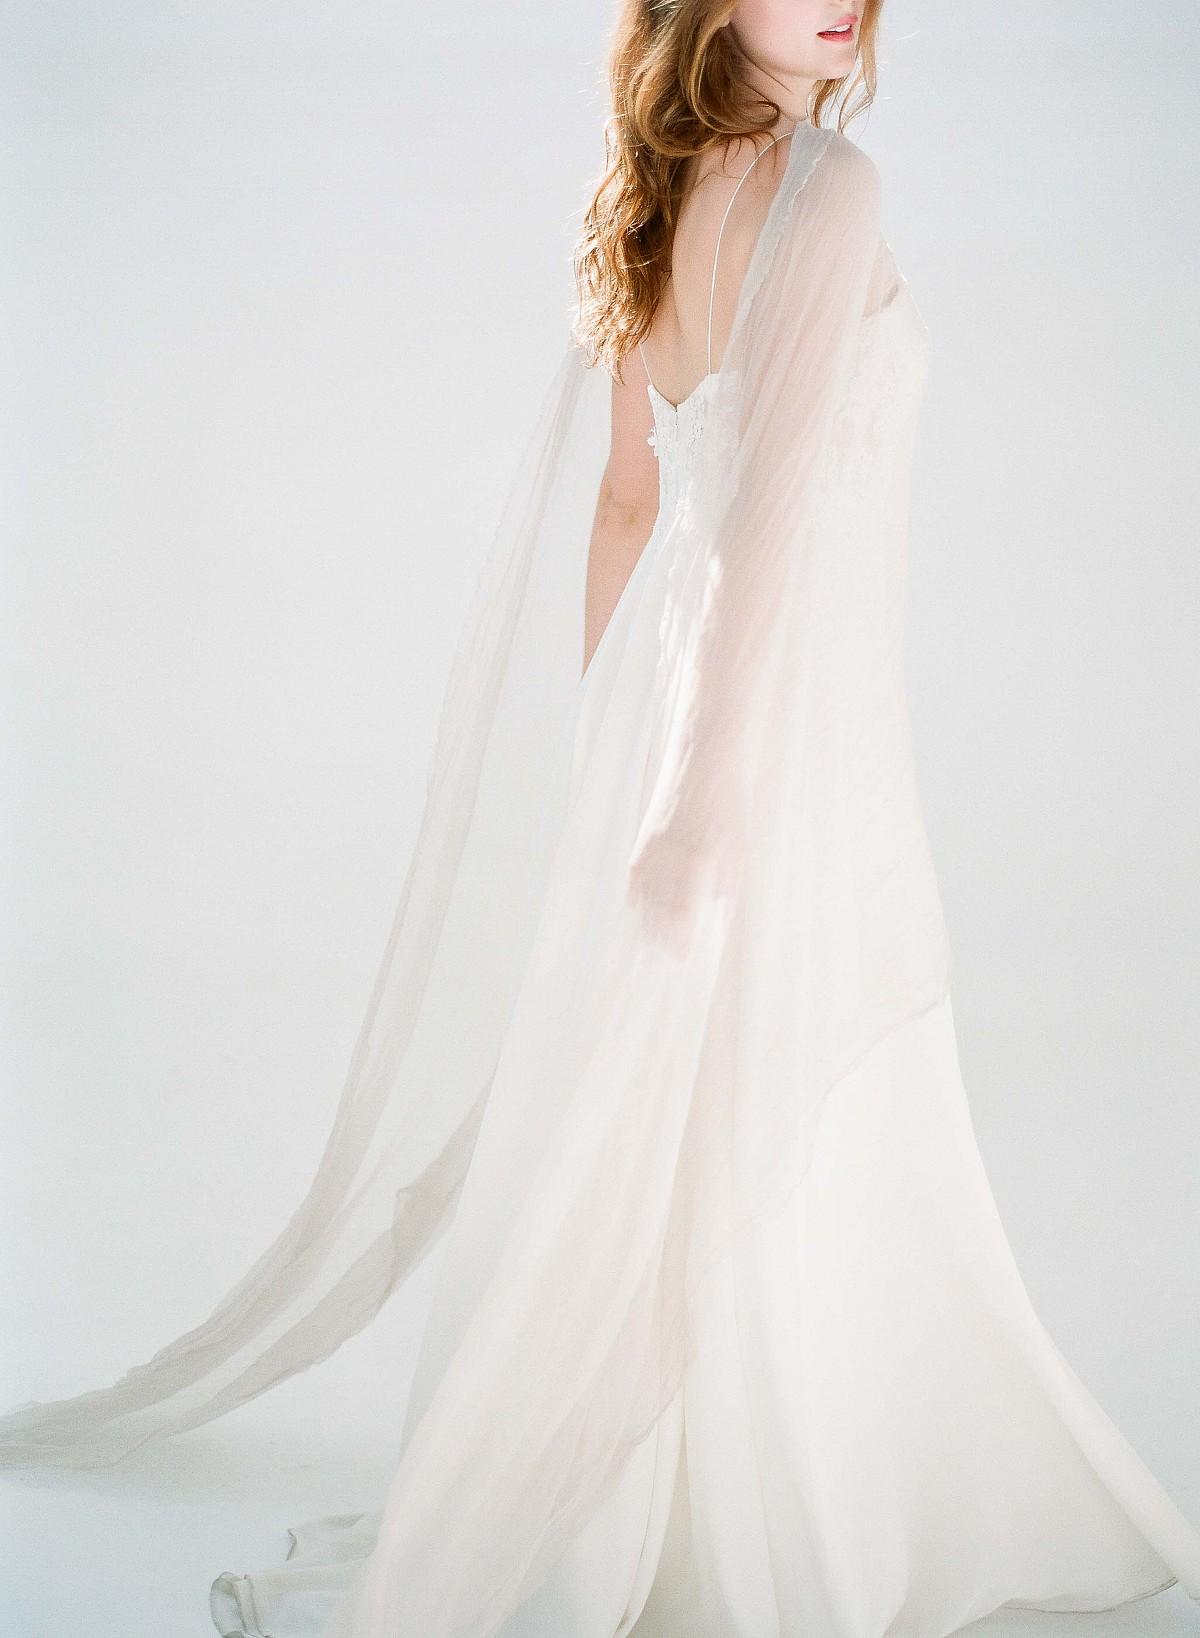 Soft and Feminine Pastel Bridal Inspiration